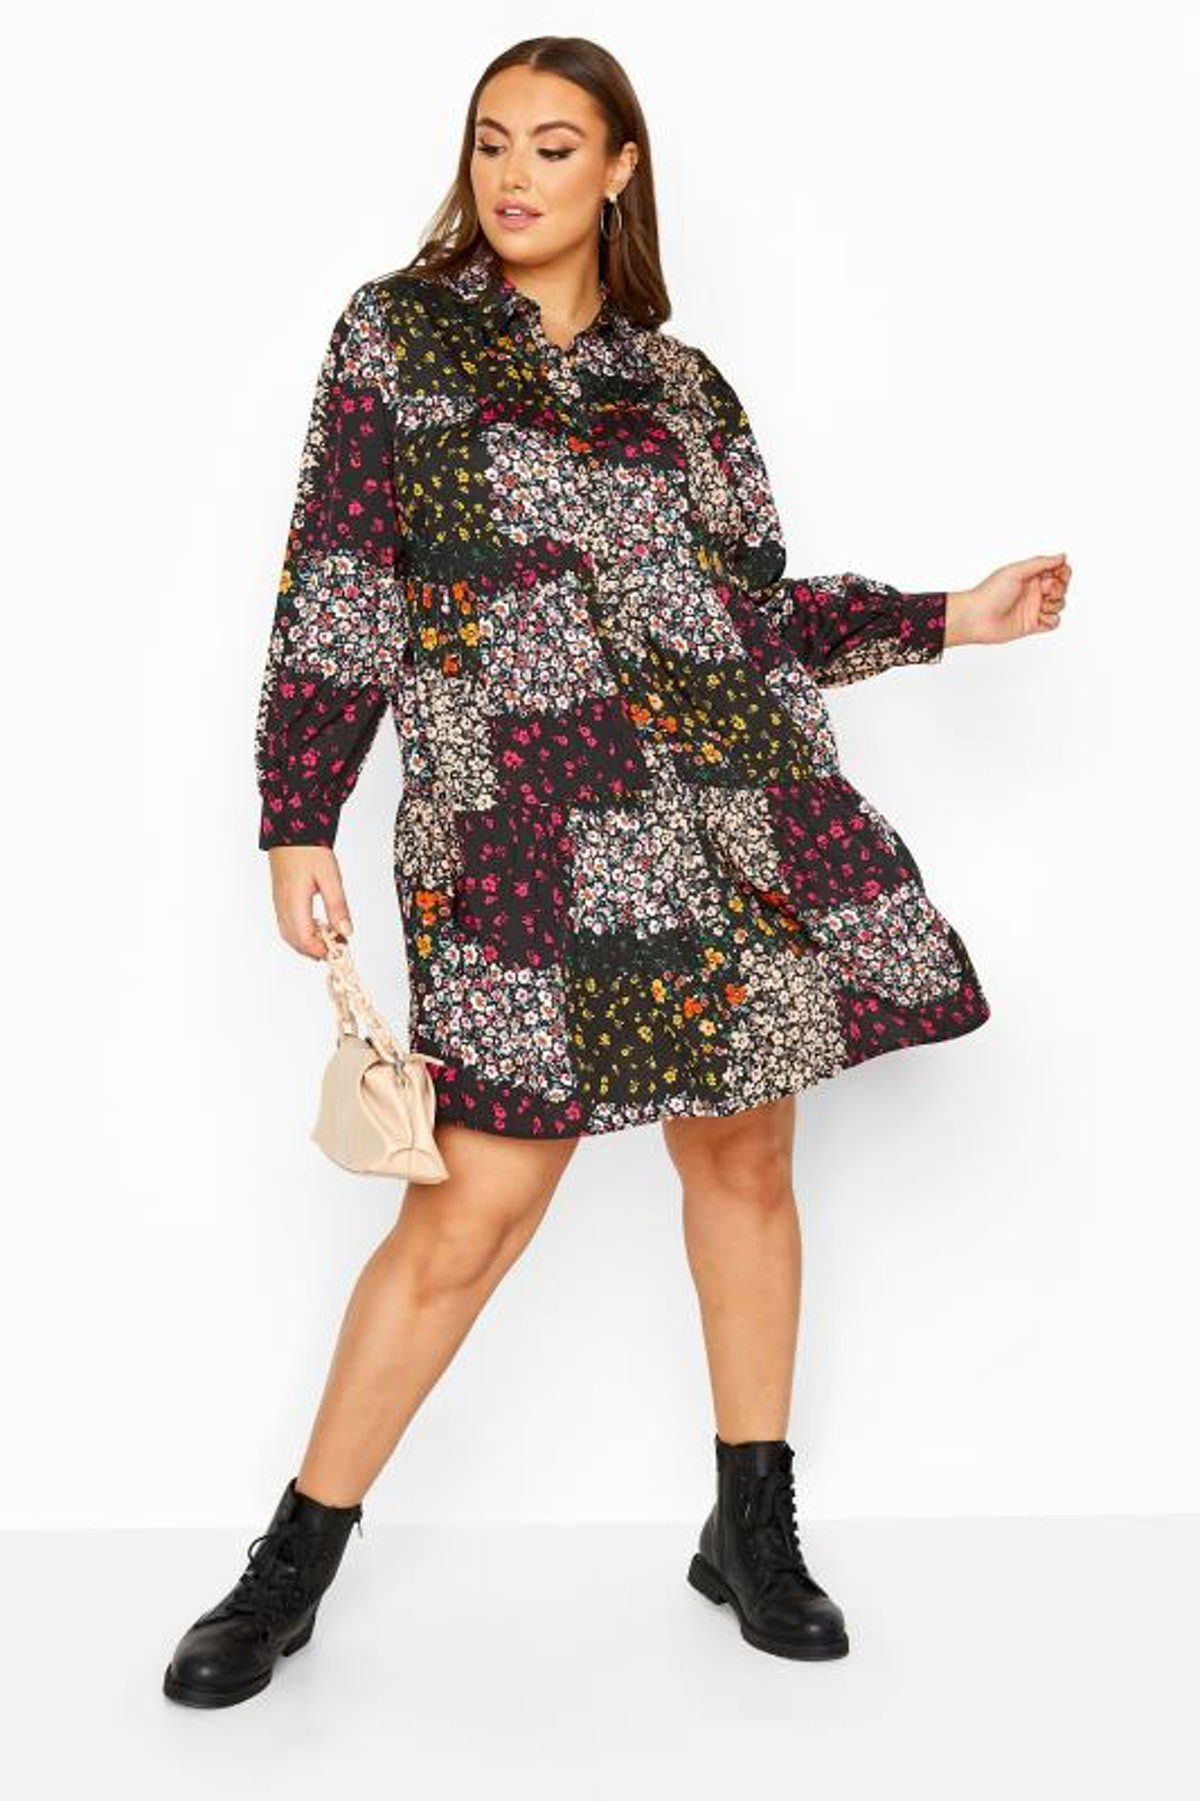 Yours Clothing Black Floral Patchwork Shirt Dress